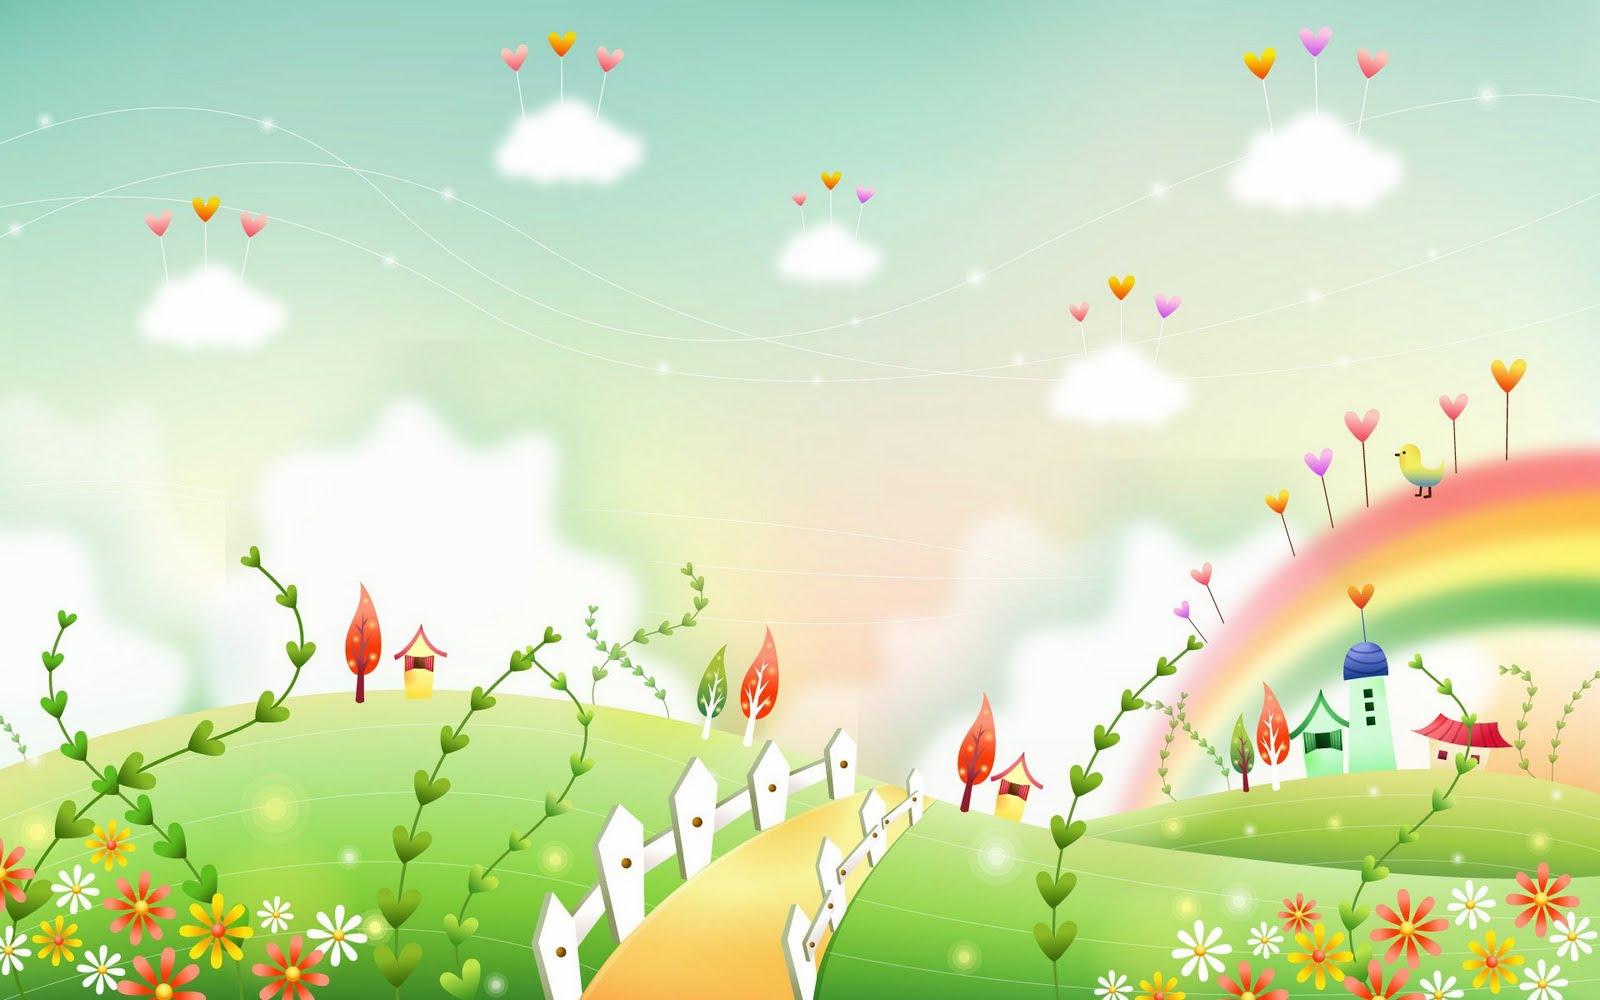 Gambar Dunia Kartun Fantasi Yang Cantik Cantik Wallpaper